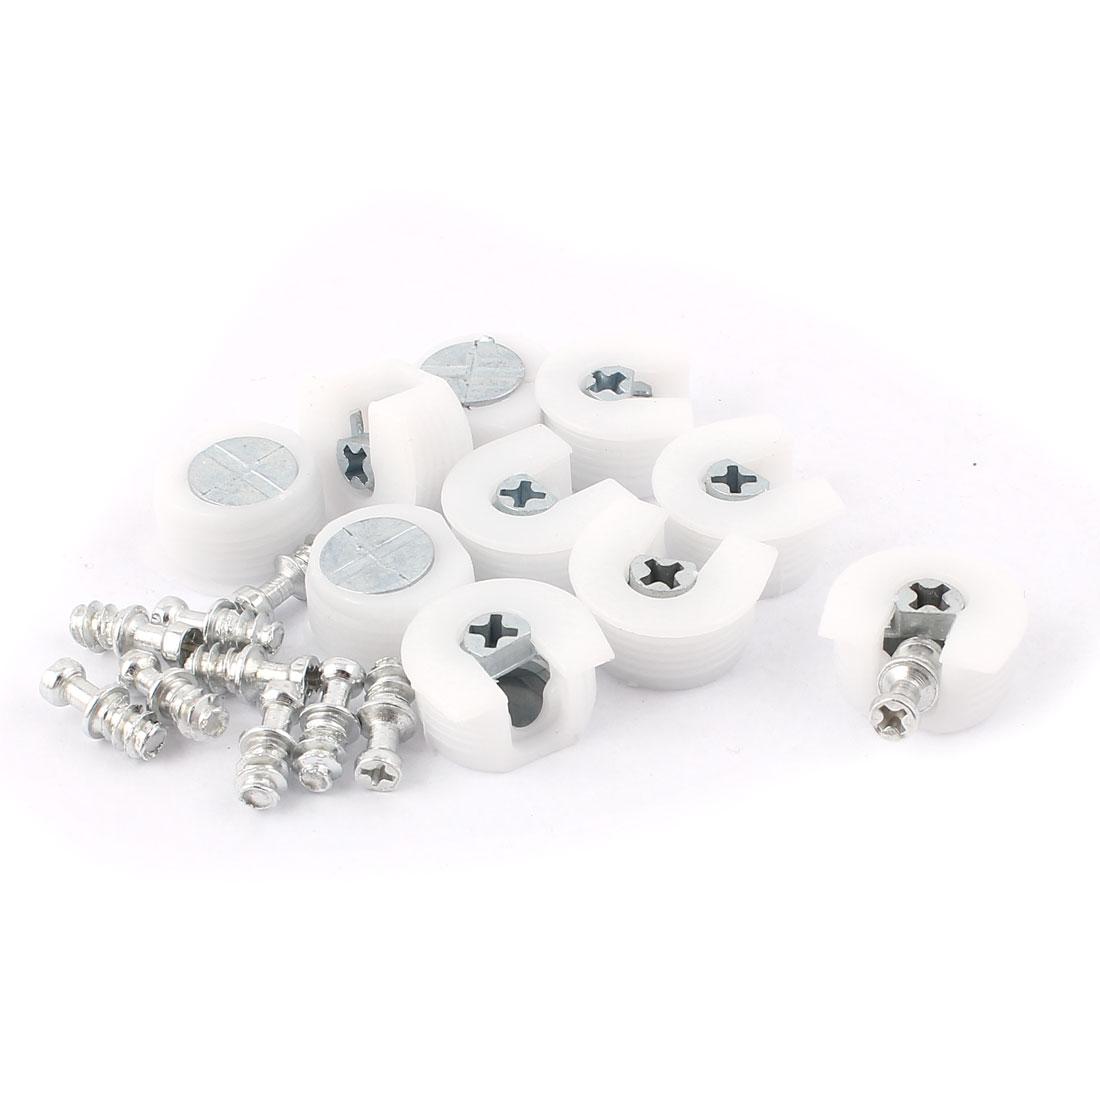 U Shape White Plastic Screw in Shelf Support Pin Peg Supporter 10pcs